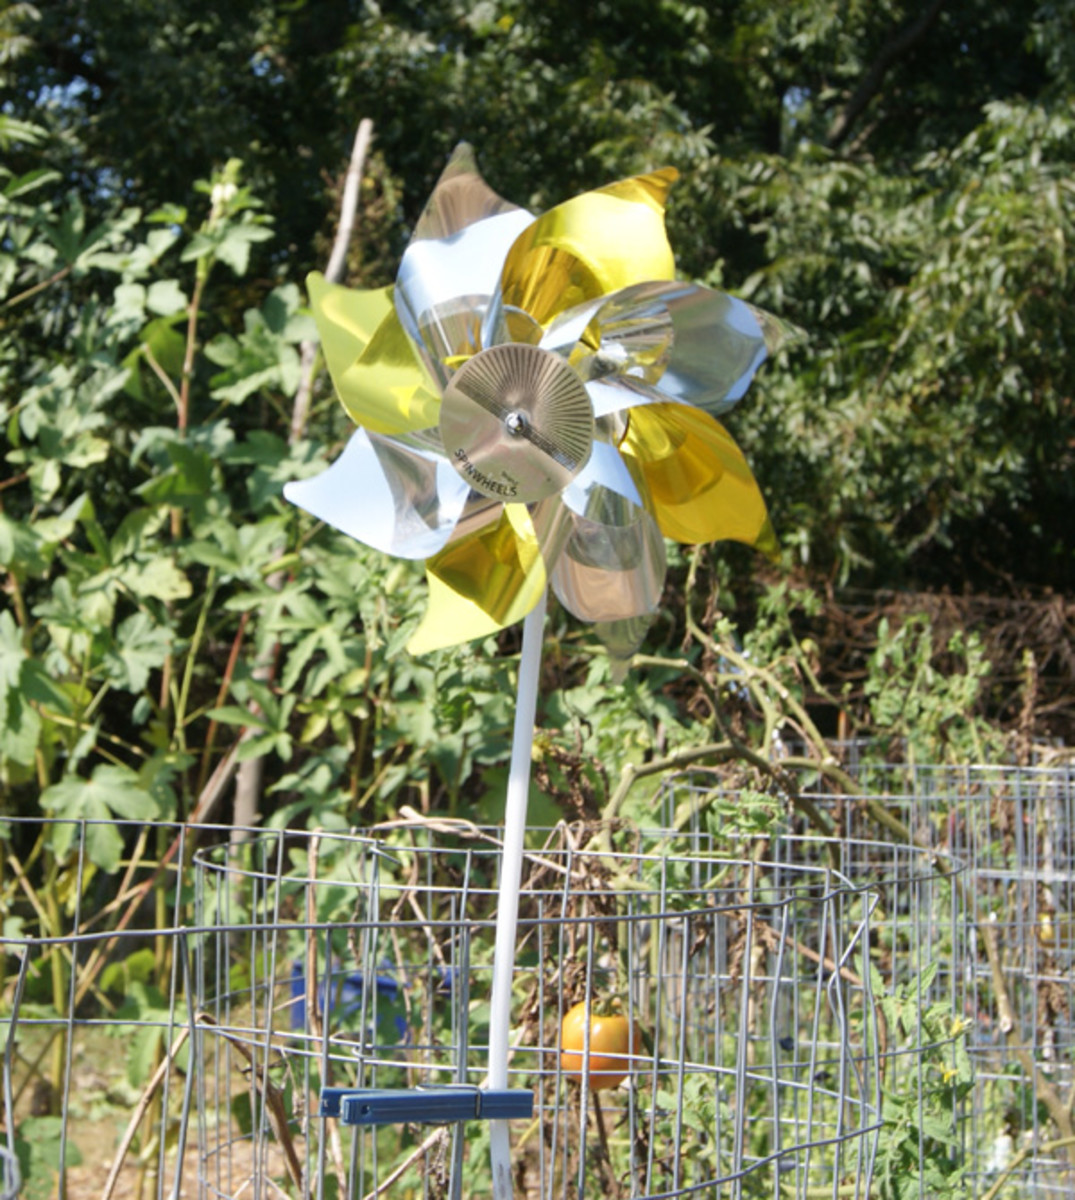 Pinwheels help keep birds away